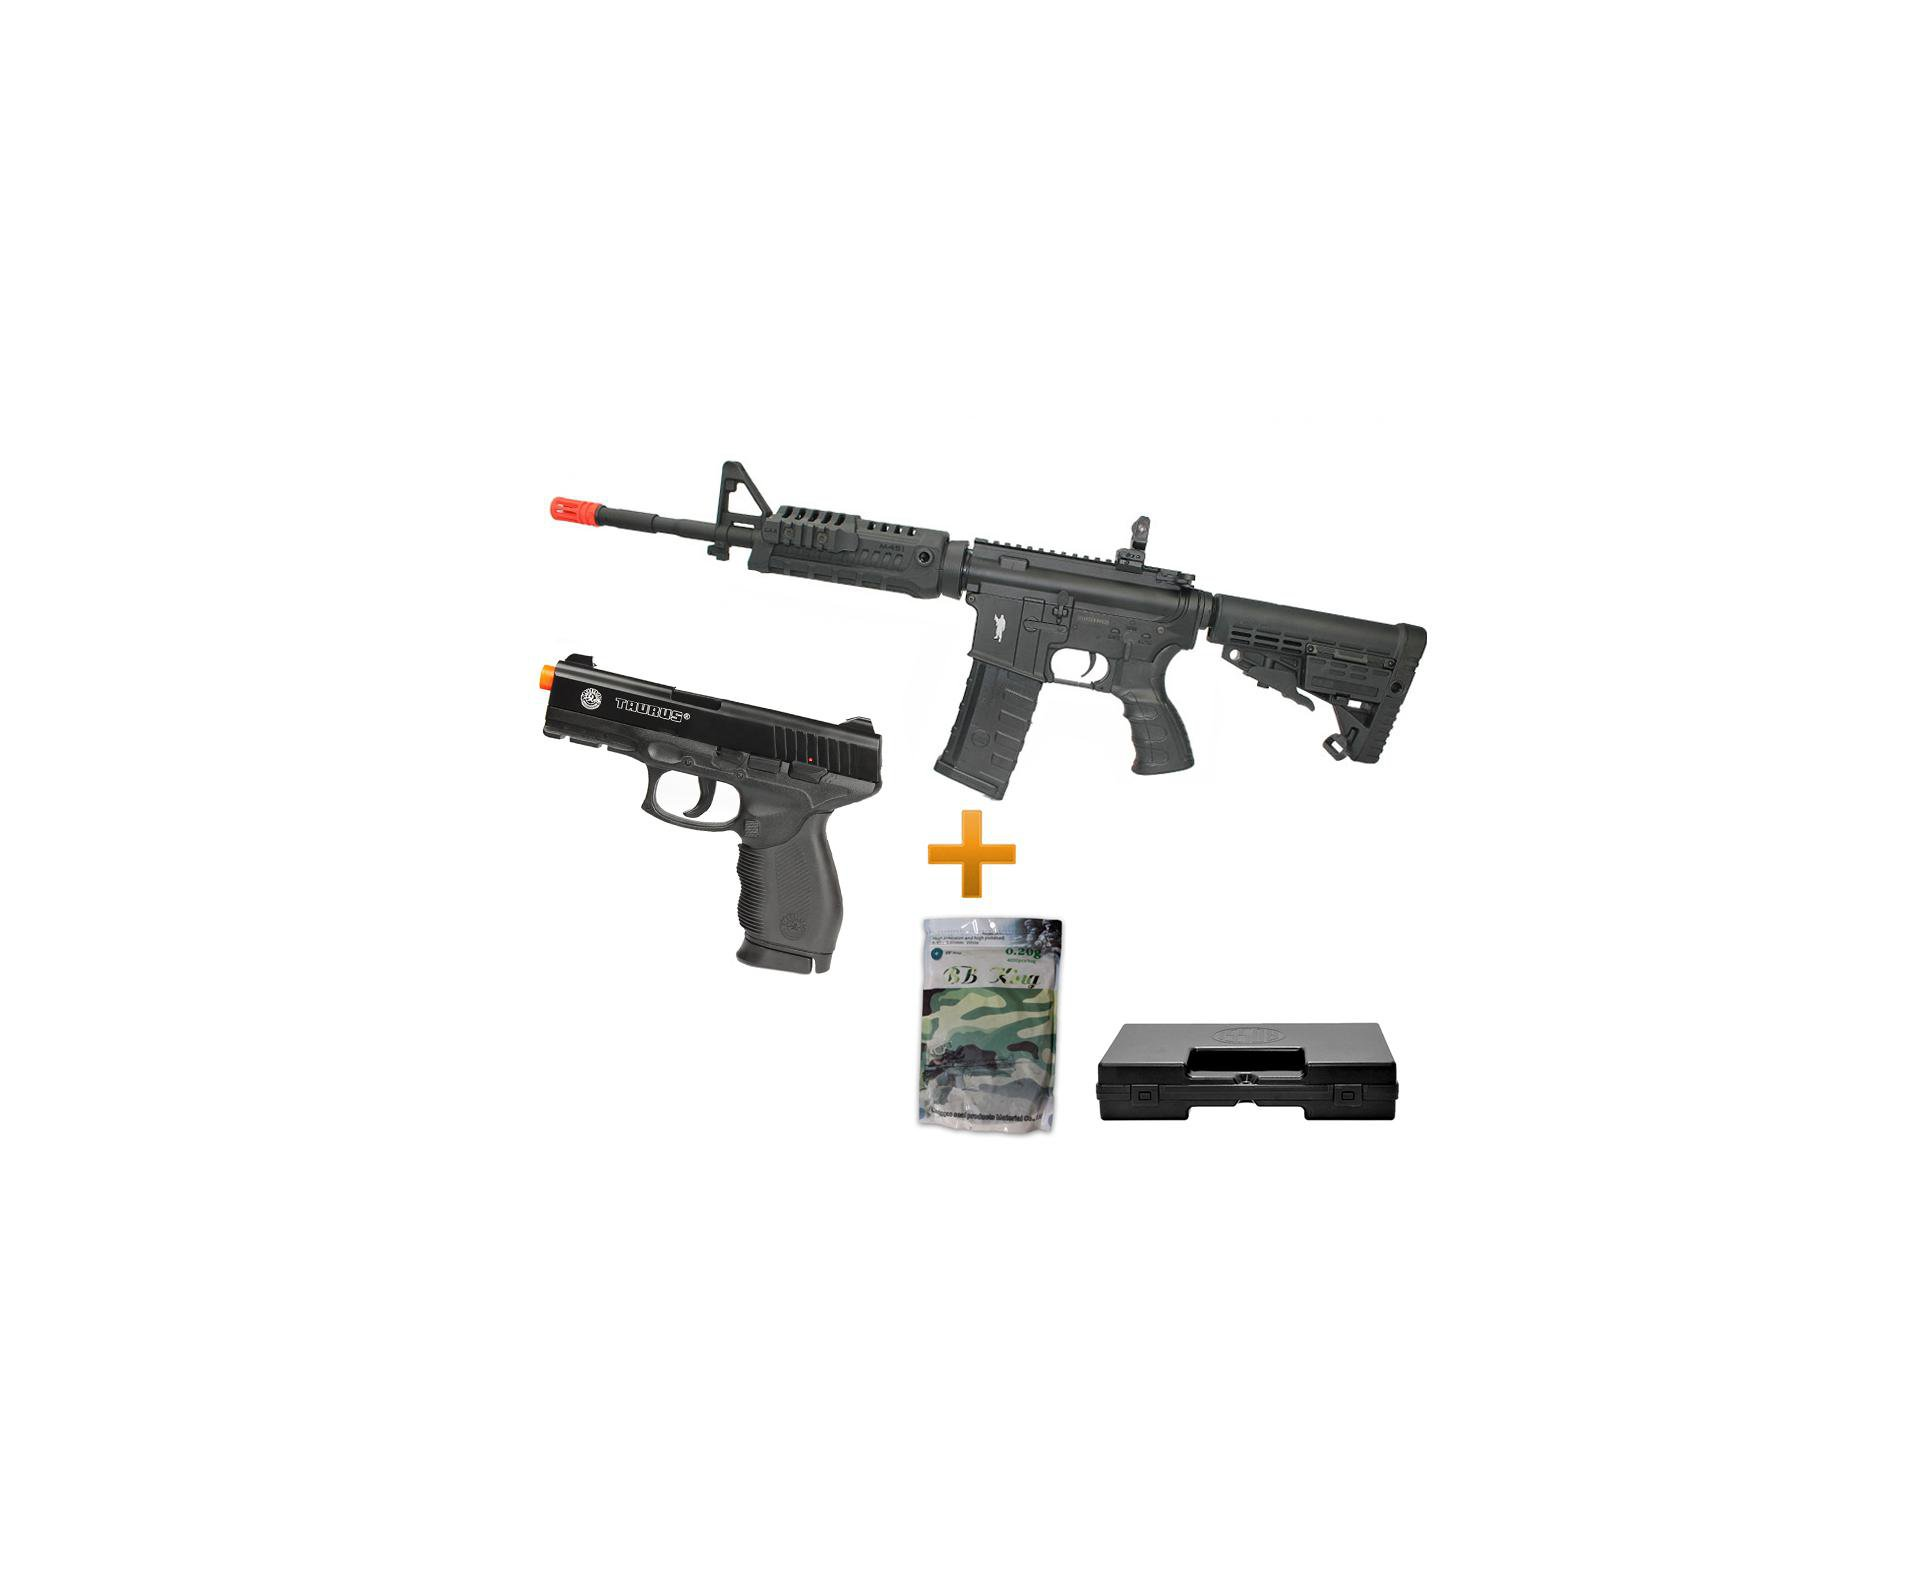 Rifle De Airsoft M4 Carbine Caa Custom Cal 6mm + Pistola Taurus Pt 24/7 Co2 + 02 Co2 + Esfera 0,20g - King Arms